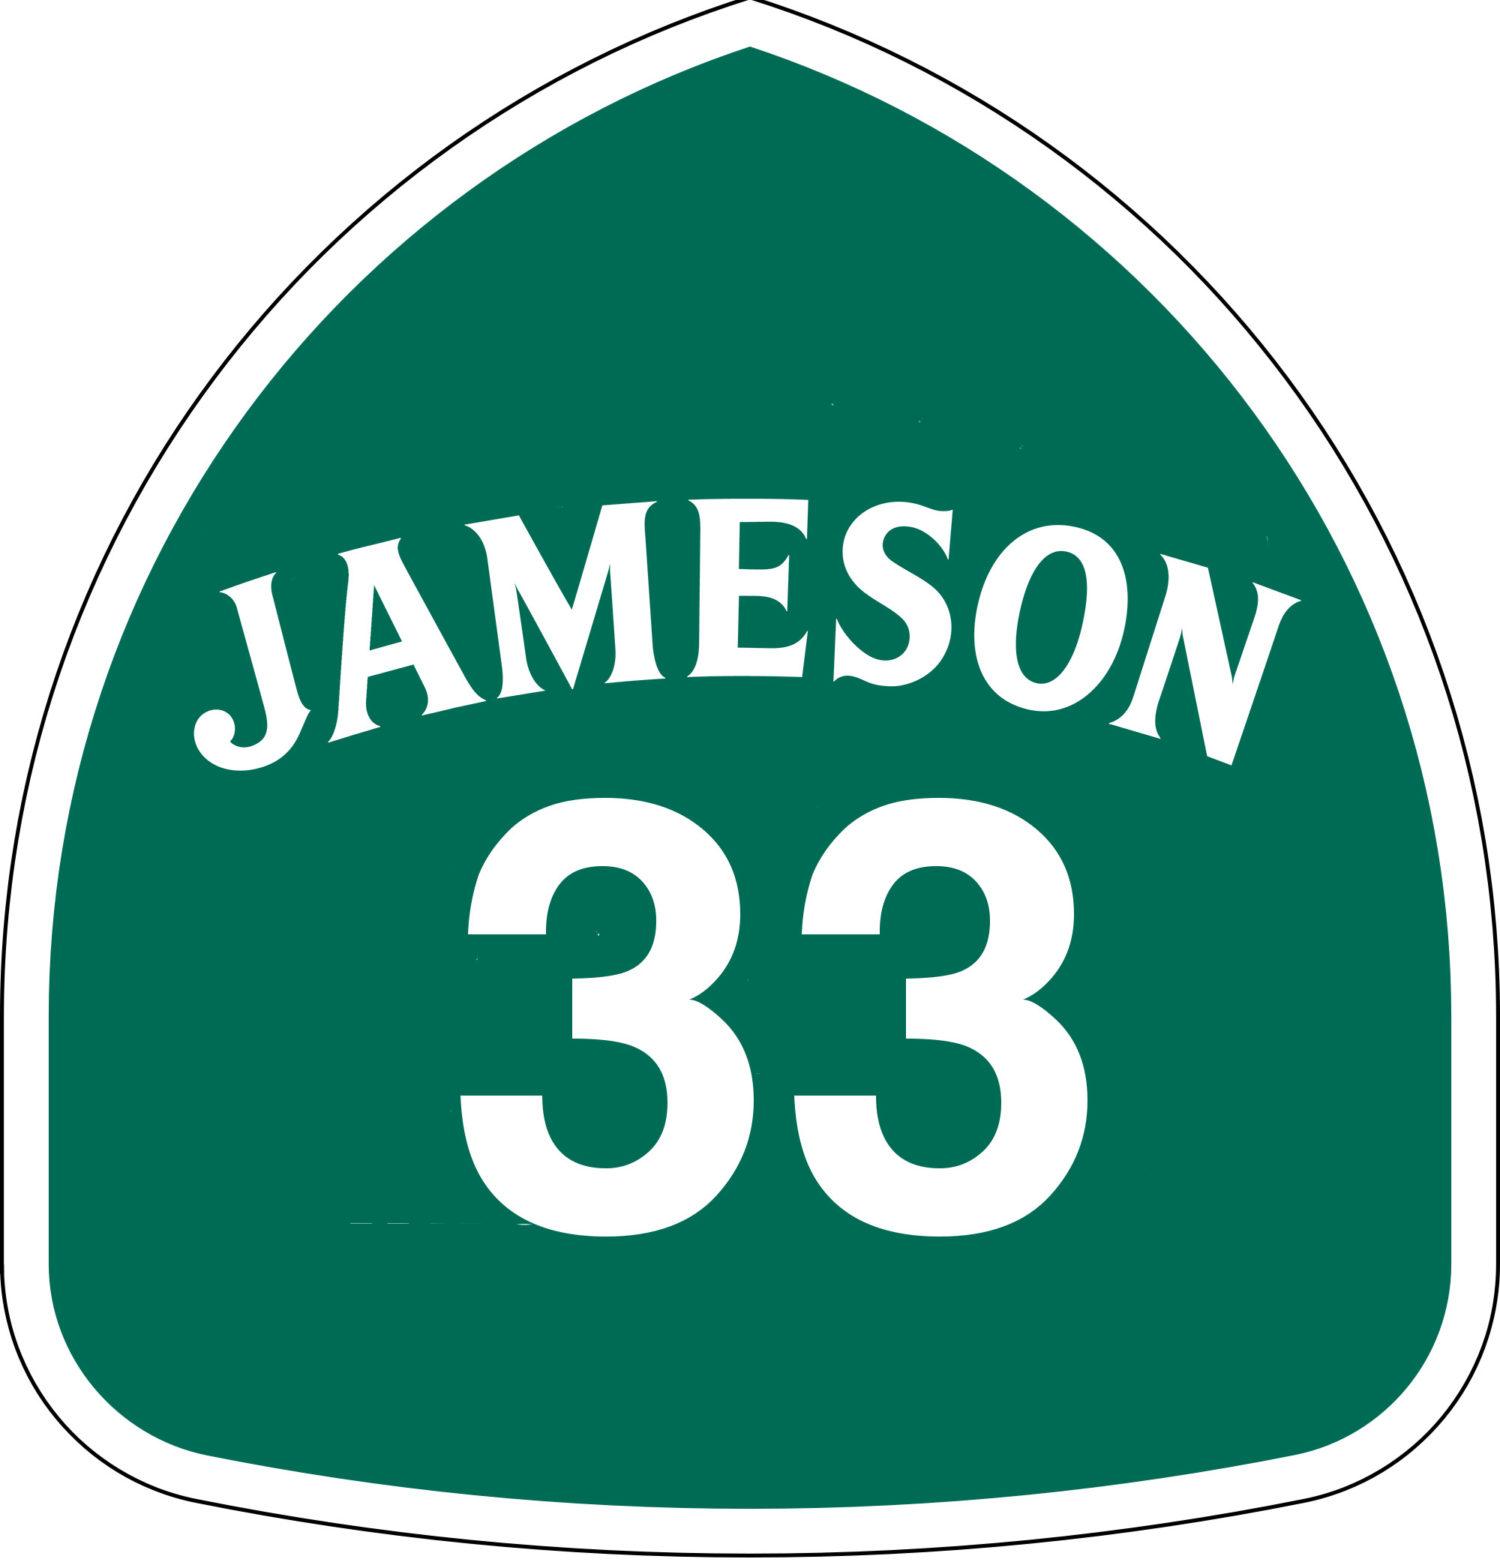 cropped-Jameson-33.jpg